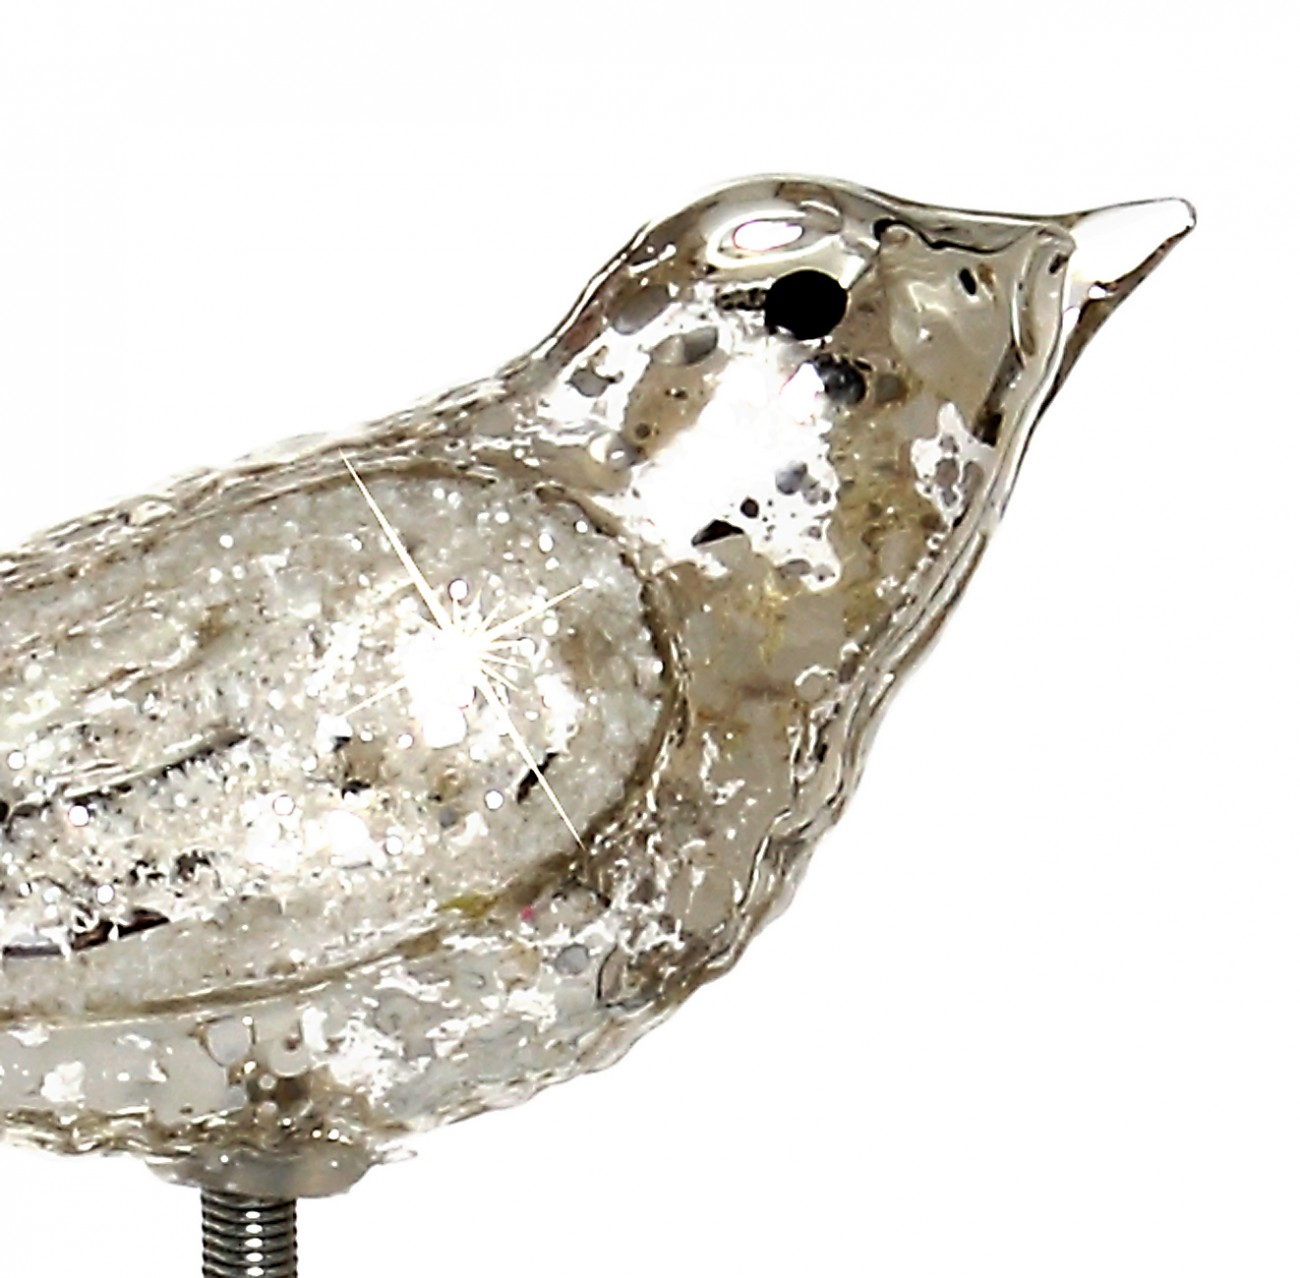 sikora christbaumschmuck glas ornament clip vogel mit federn und glimmer dekor silber 3er. Black Bedroom Furniture Sets. Home Design Ideas